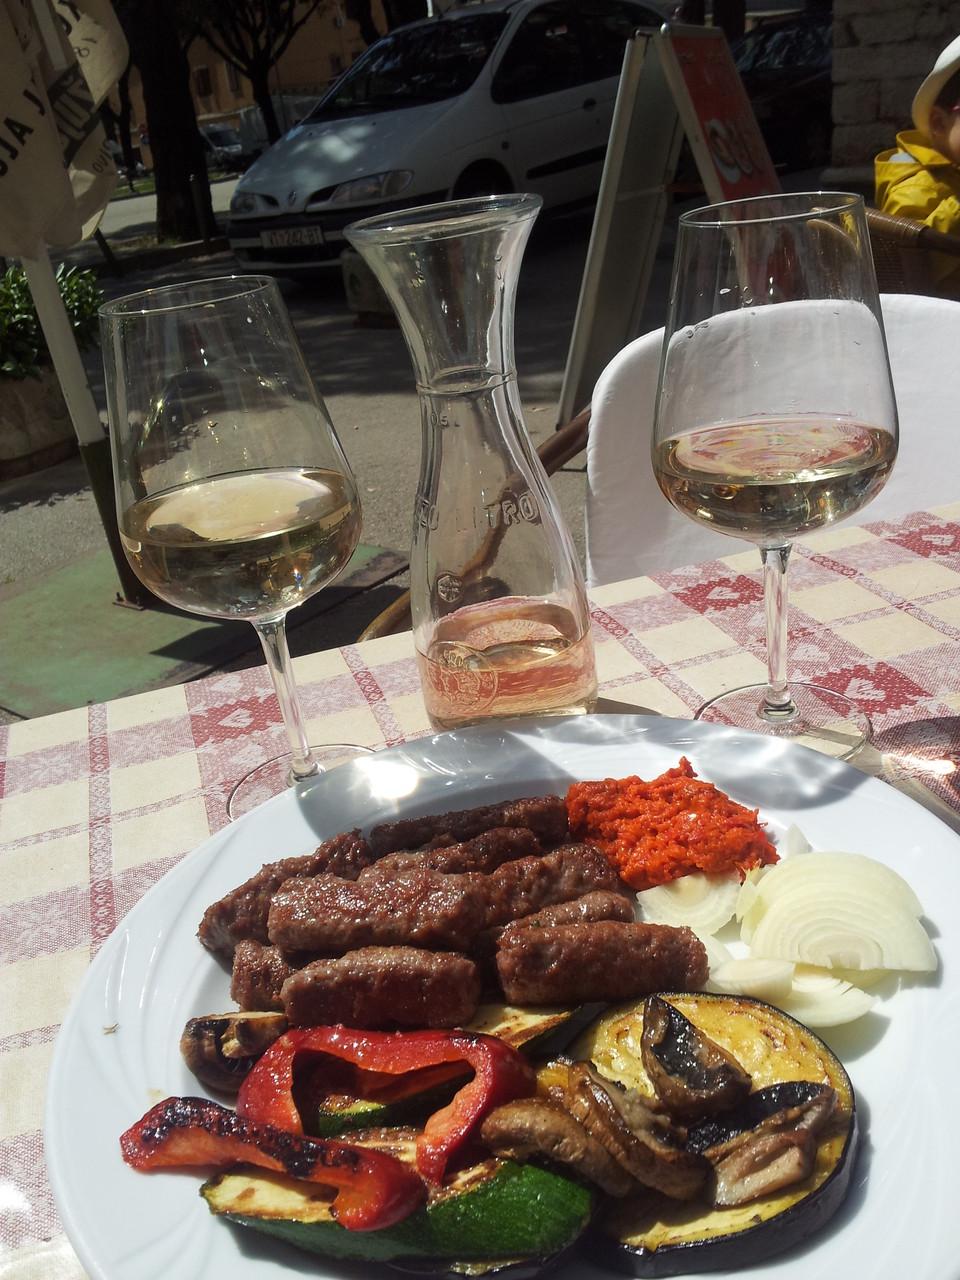 tipycally Istrian degustation....